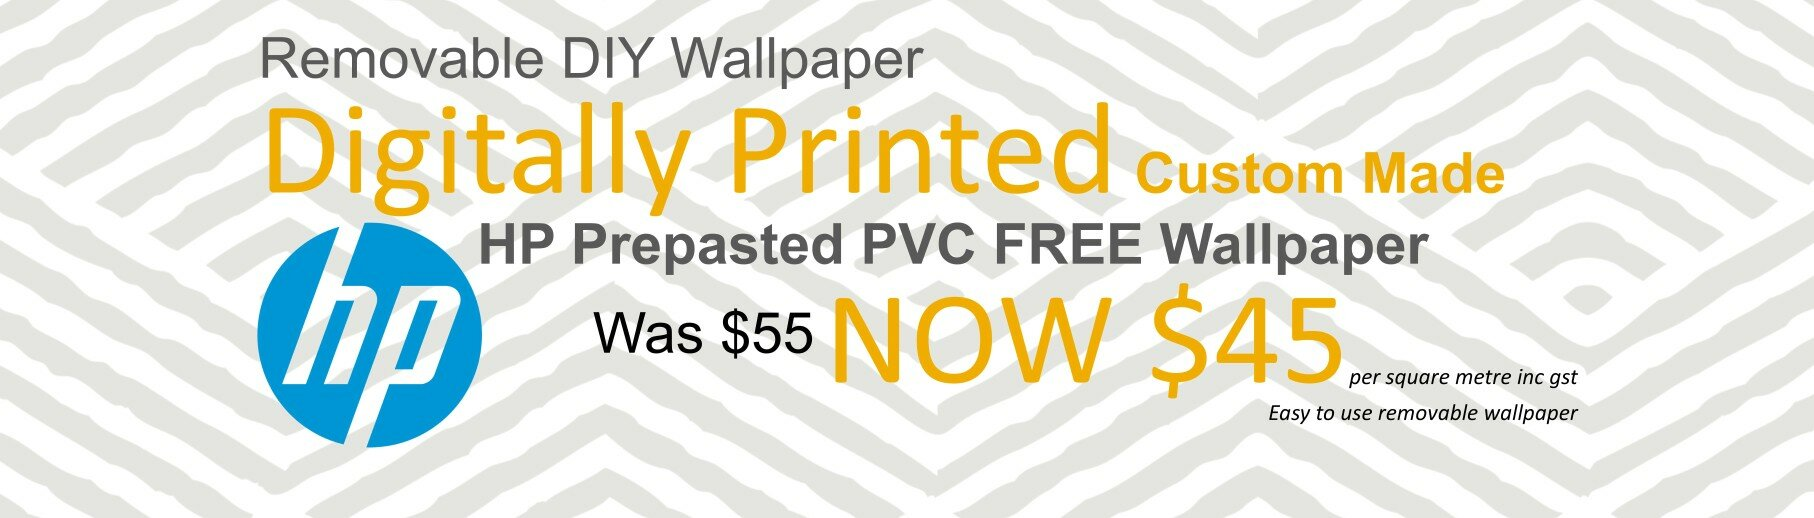 HP-Prepasted-Wallpaper-small-3-half